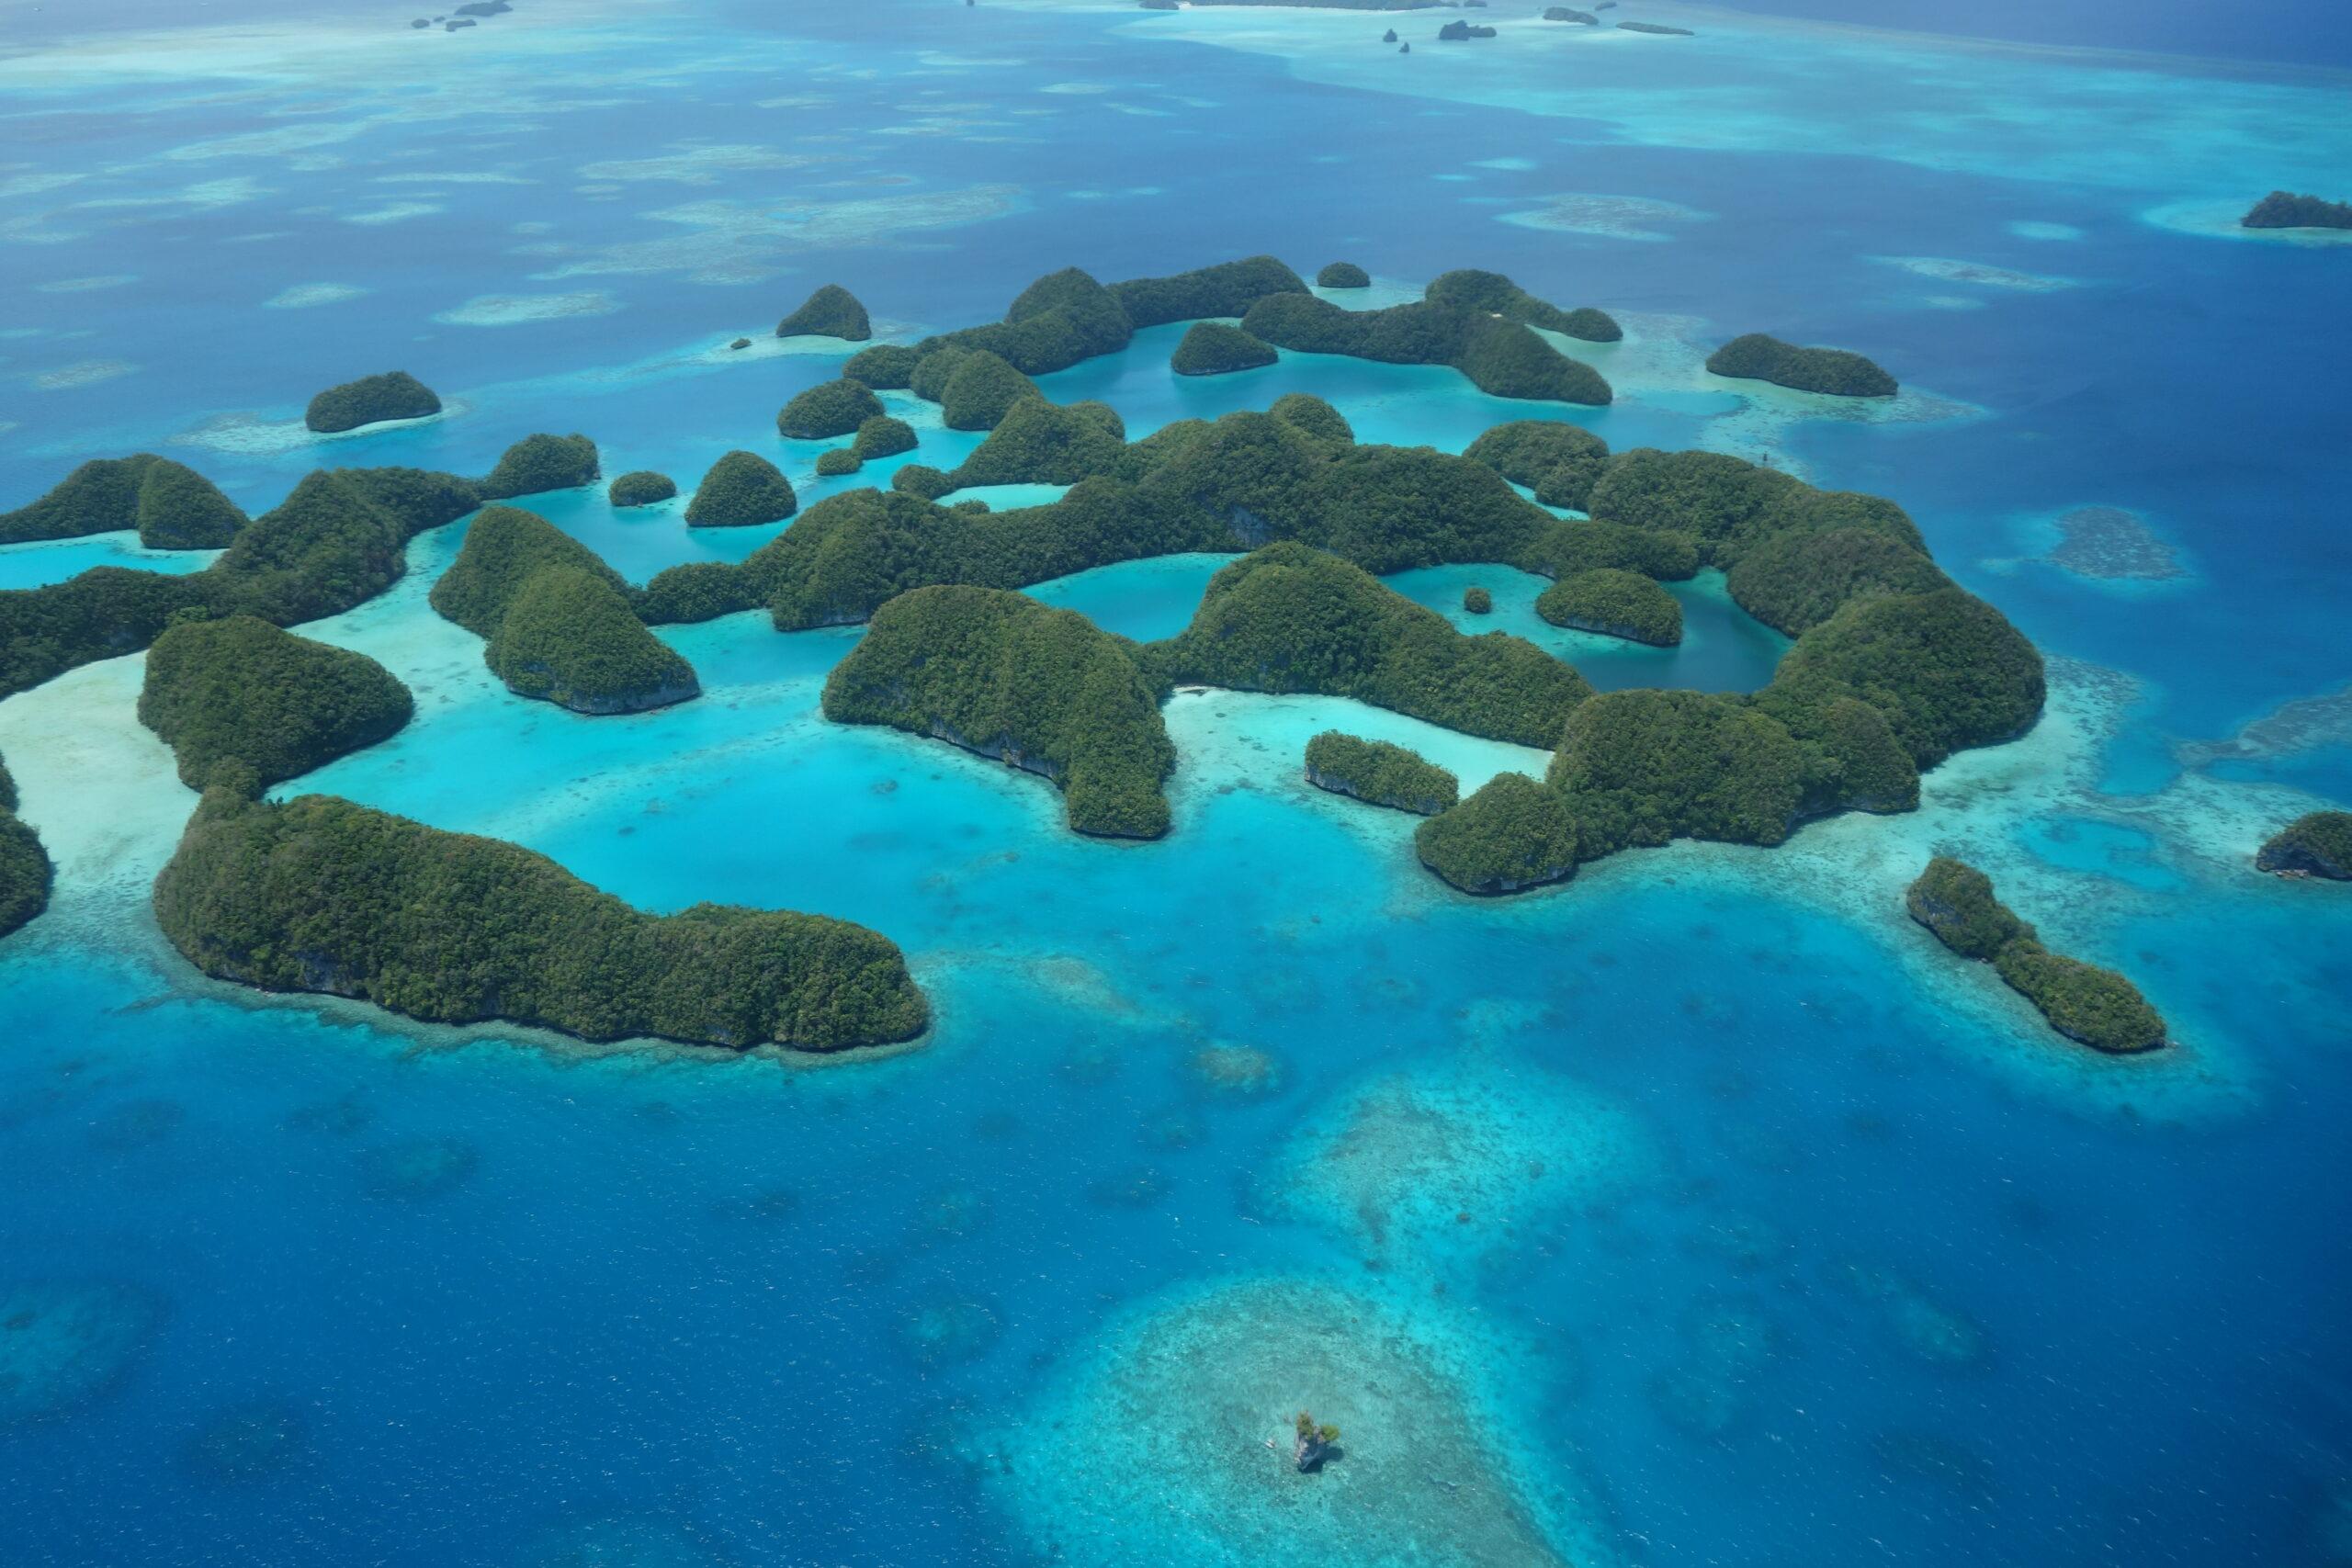 trip to island|islands travel planner app